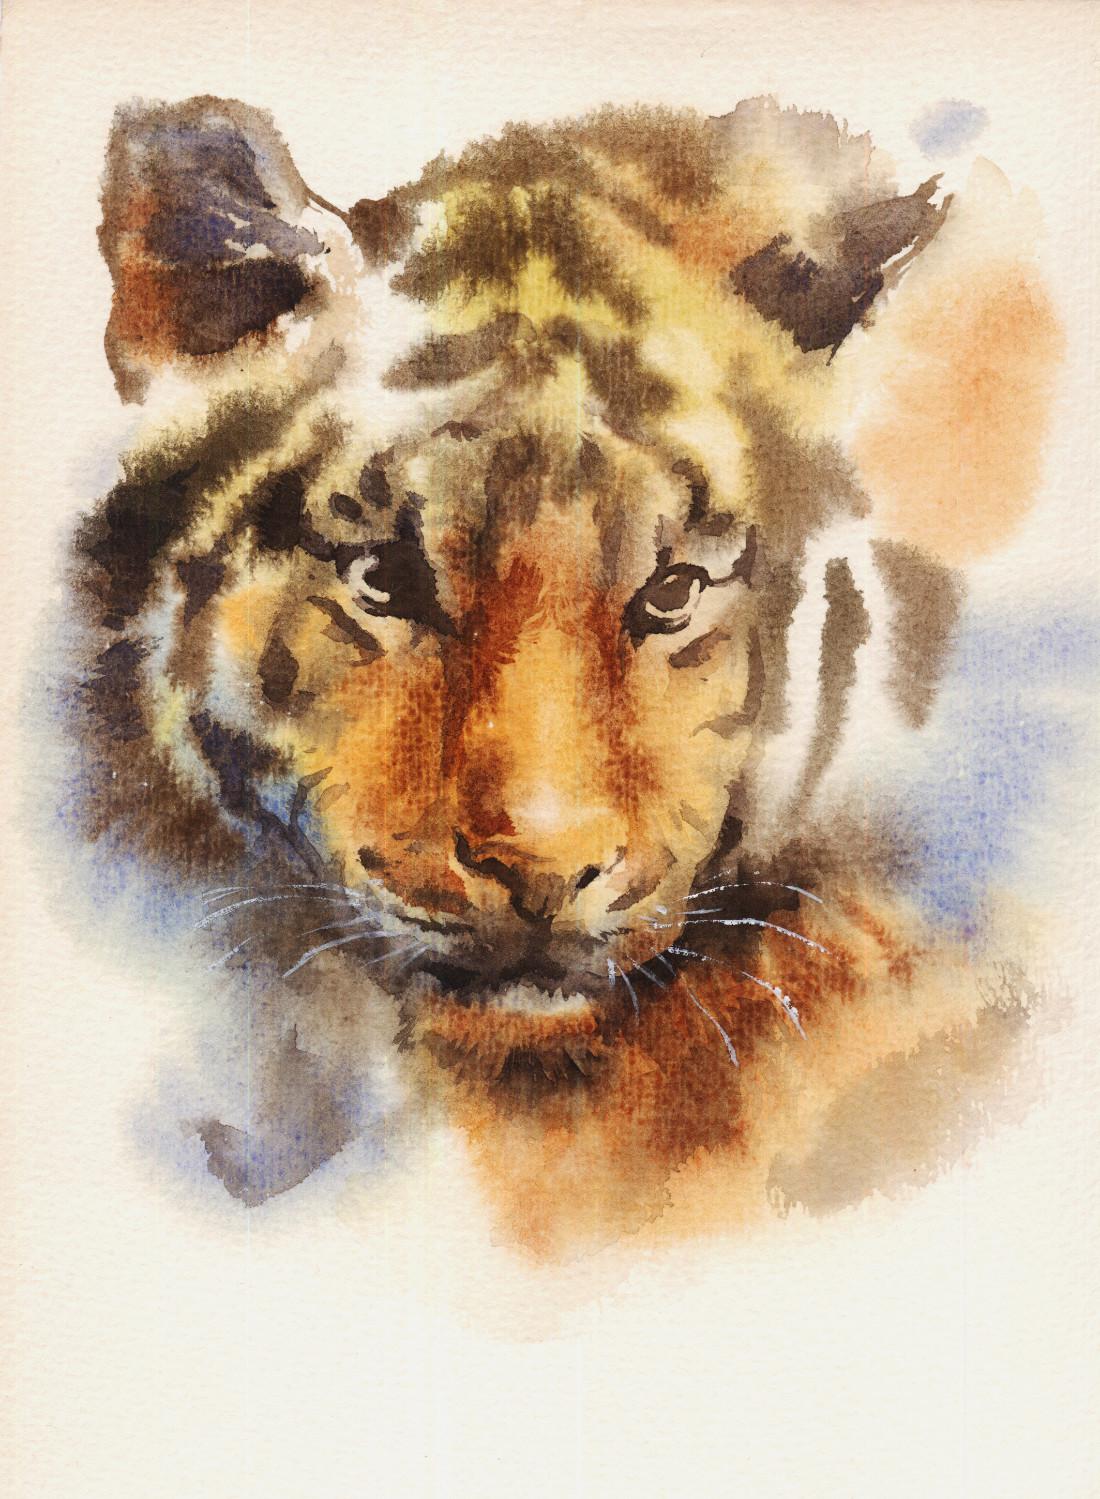 Zoltan korcsok tigerhex